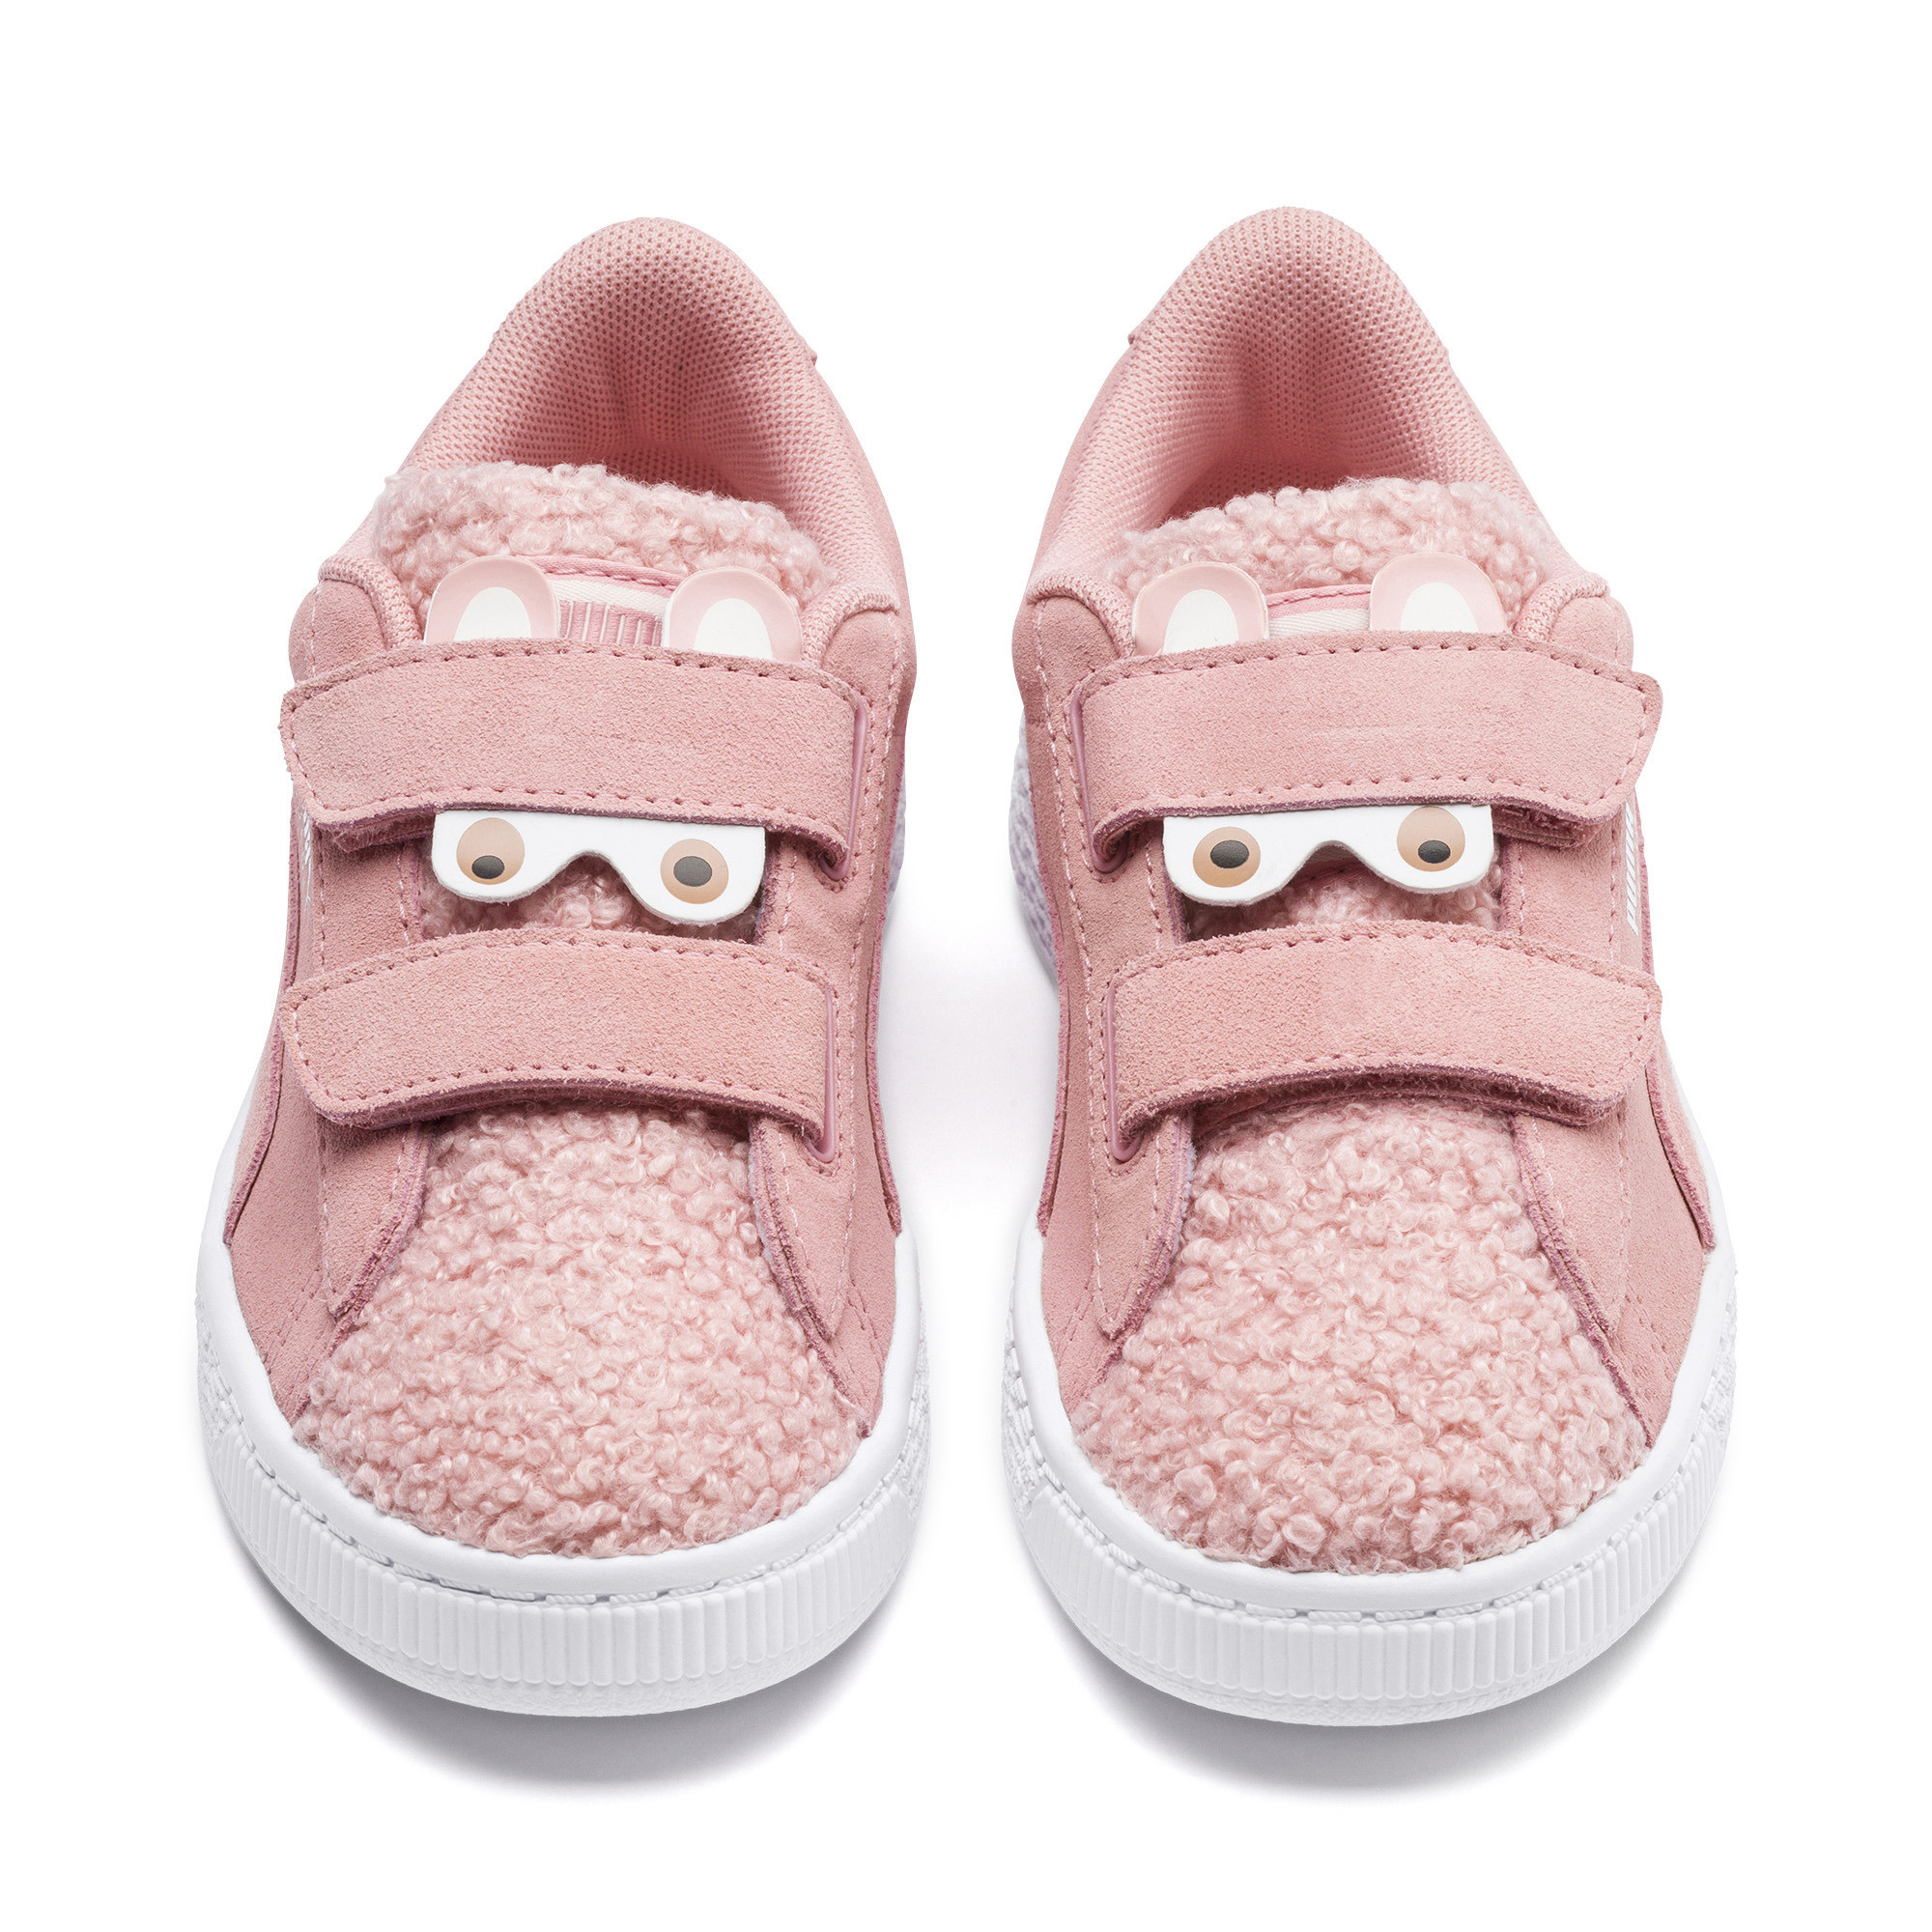 PUMA-Suede-Winter-Monster-Little-Kids-039-Shoes-Kids-Shoe-Kids thumbnail 8